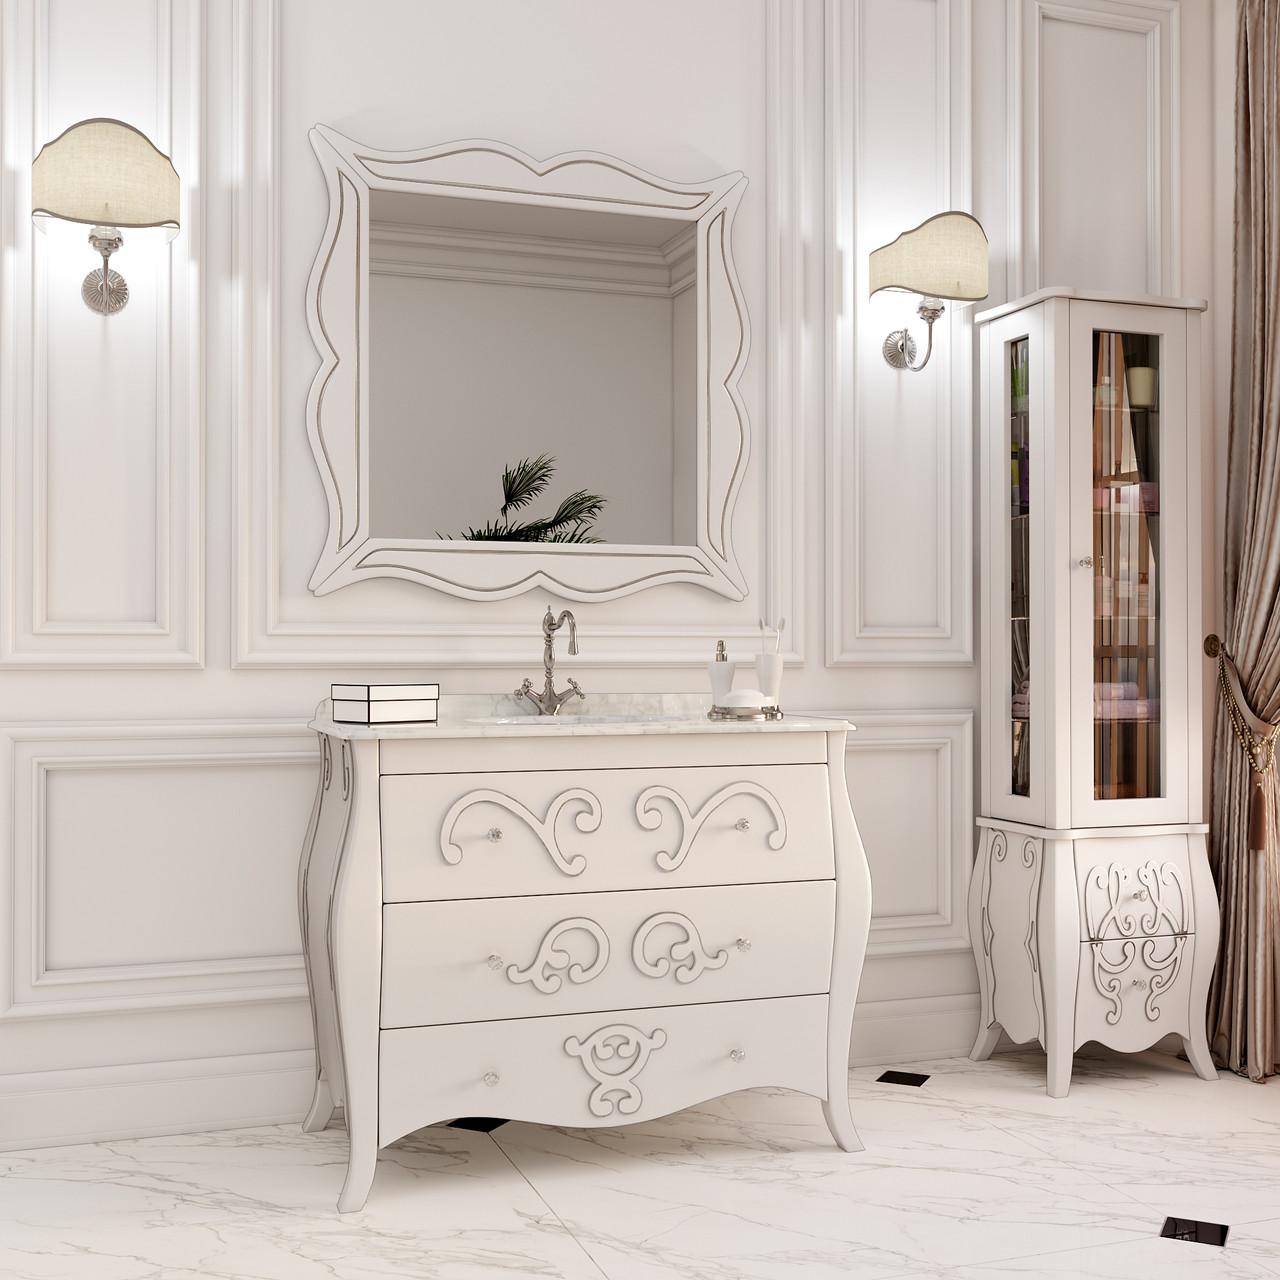 Тумба для ванной комнаты Marsan Arlette 900 контур серебро